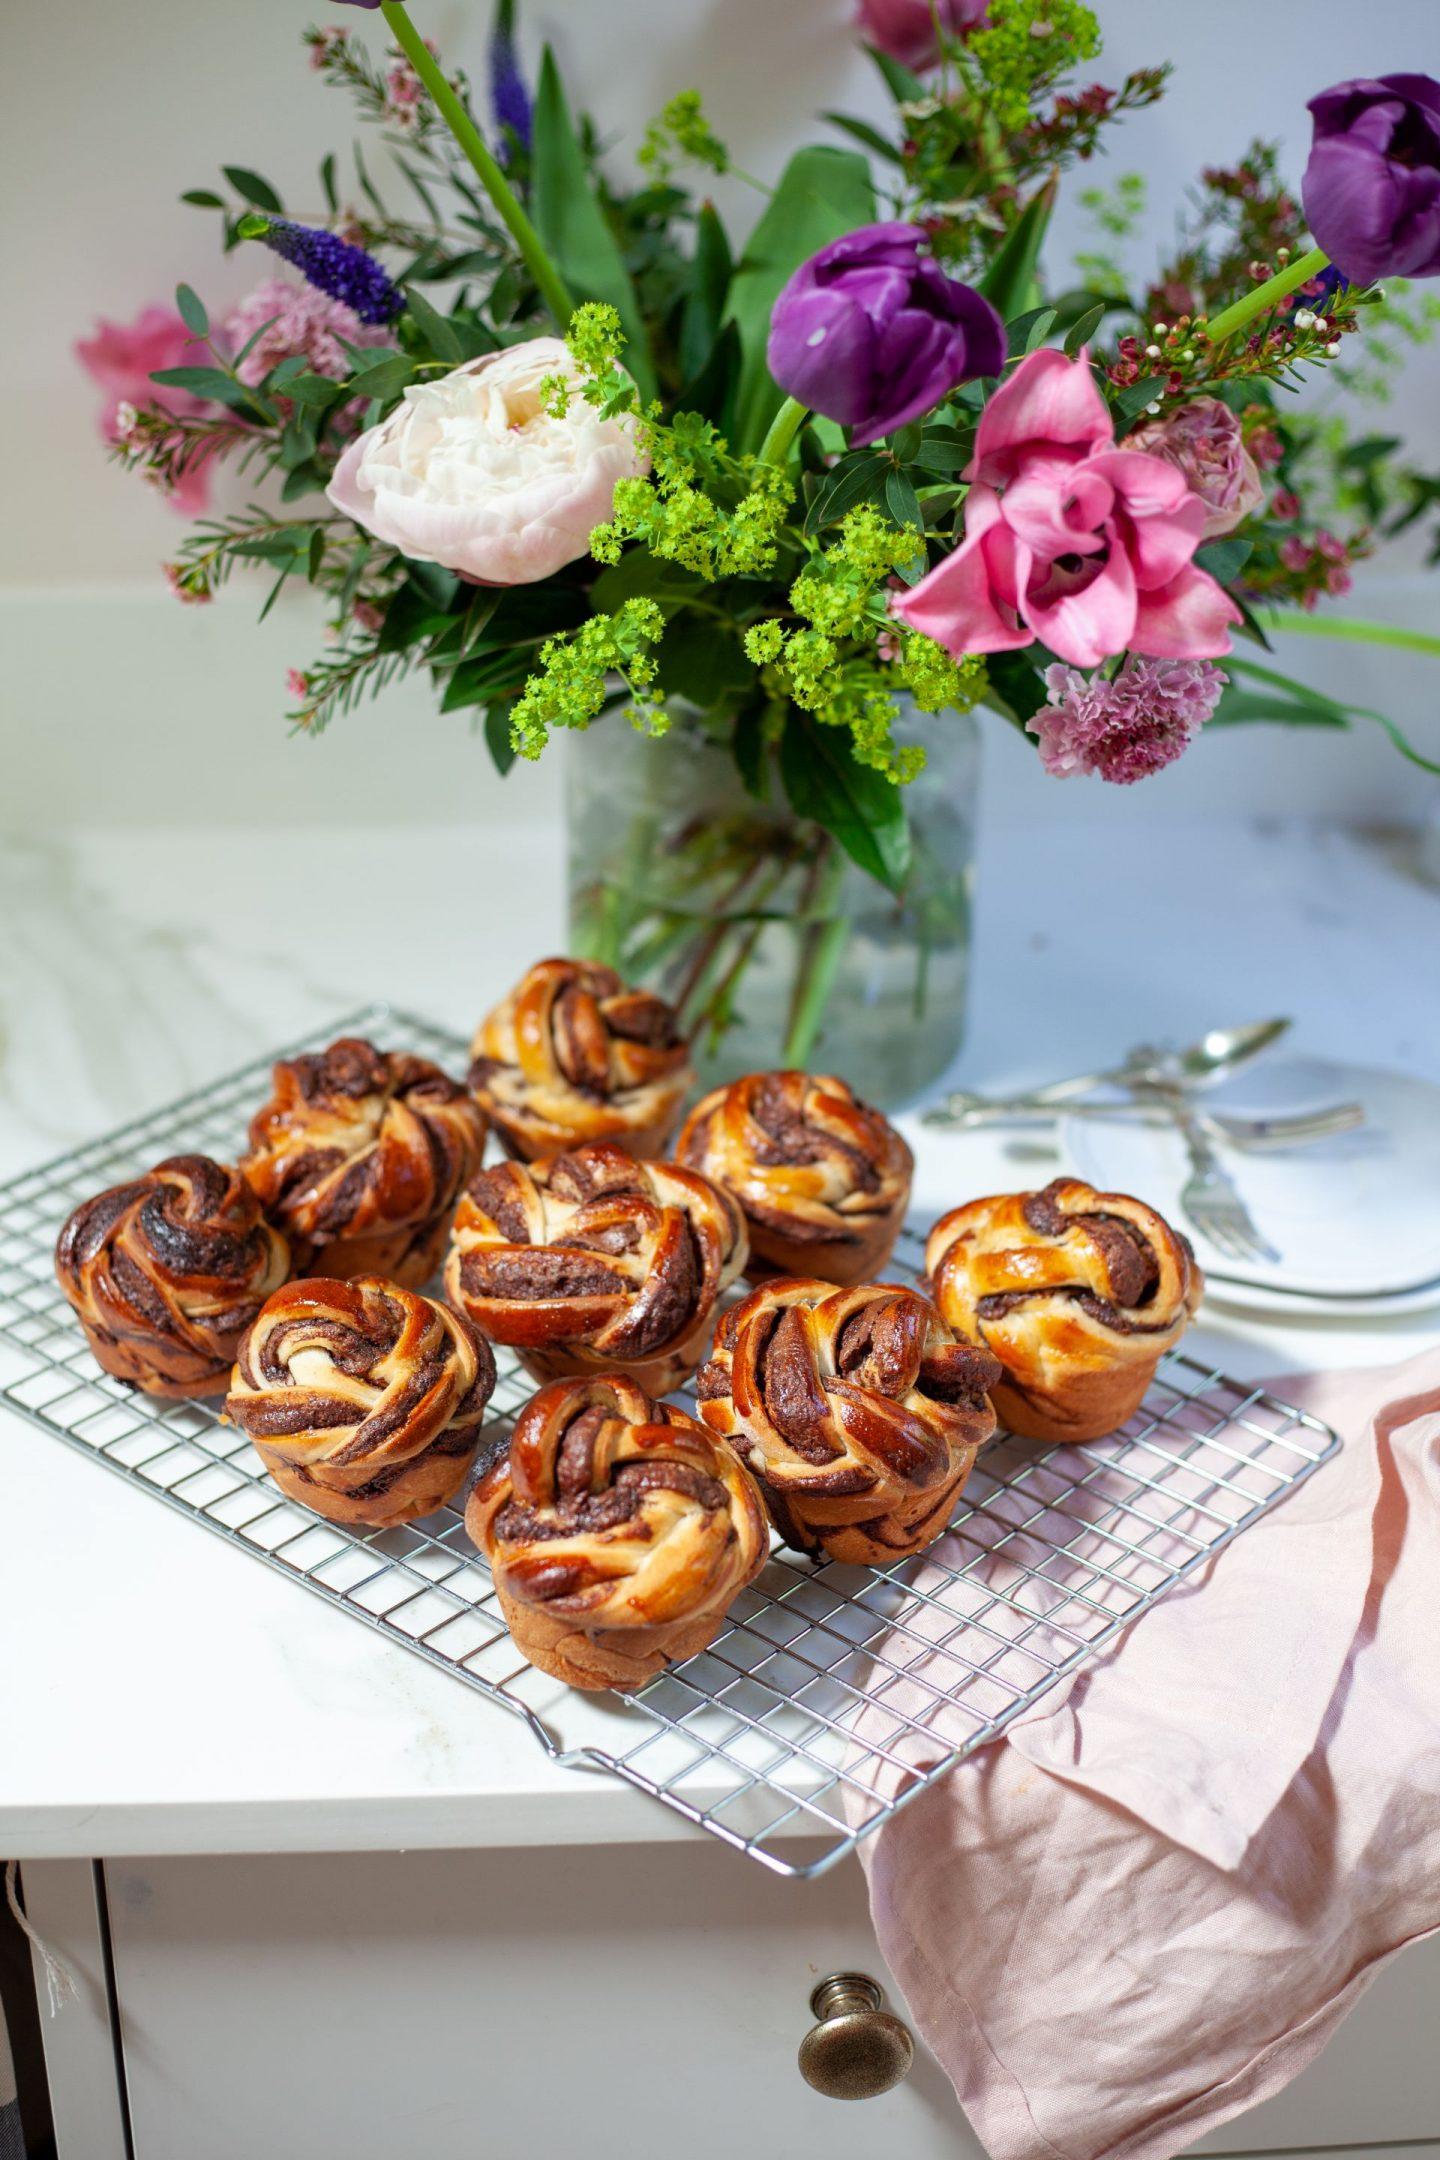 Nutella Swedish buns